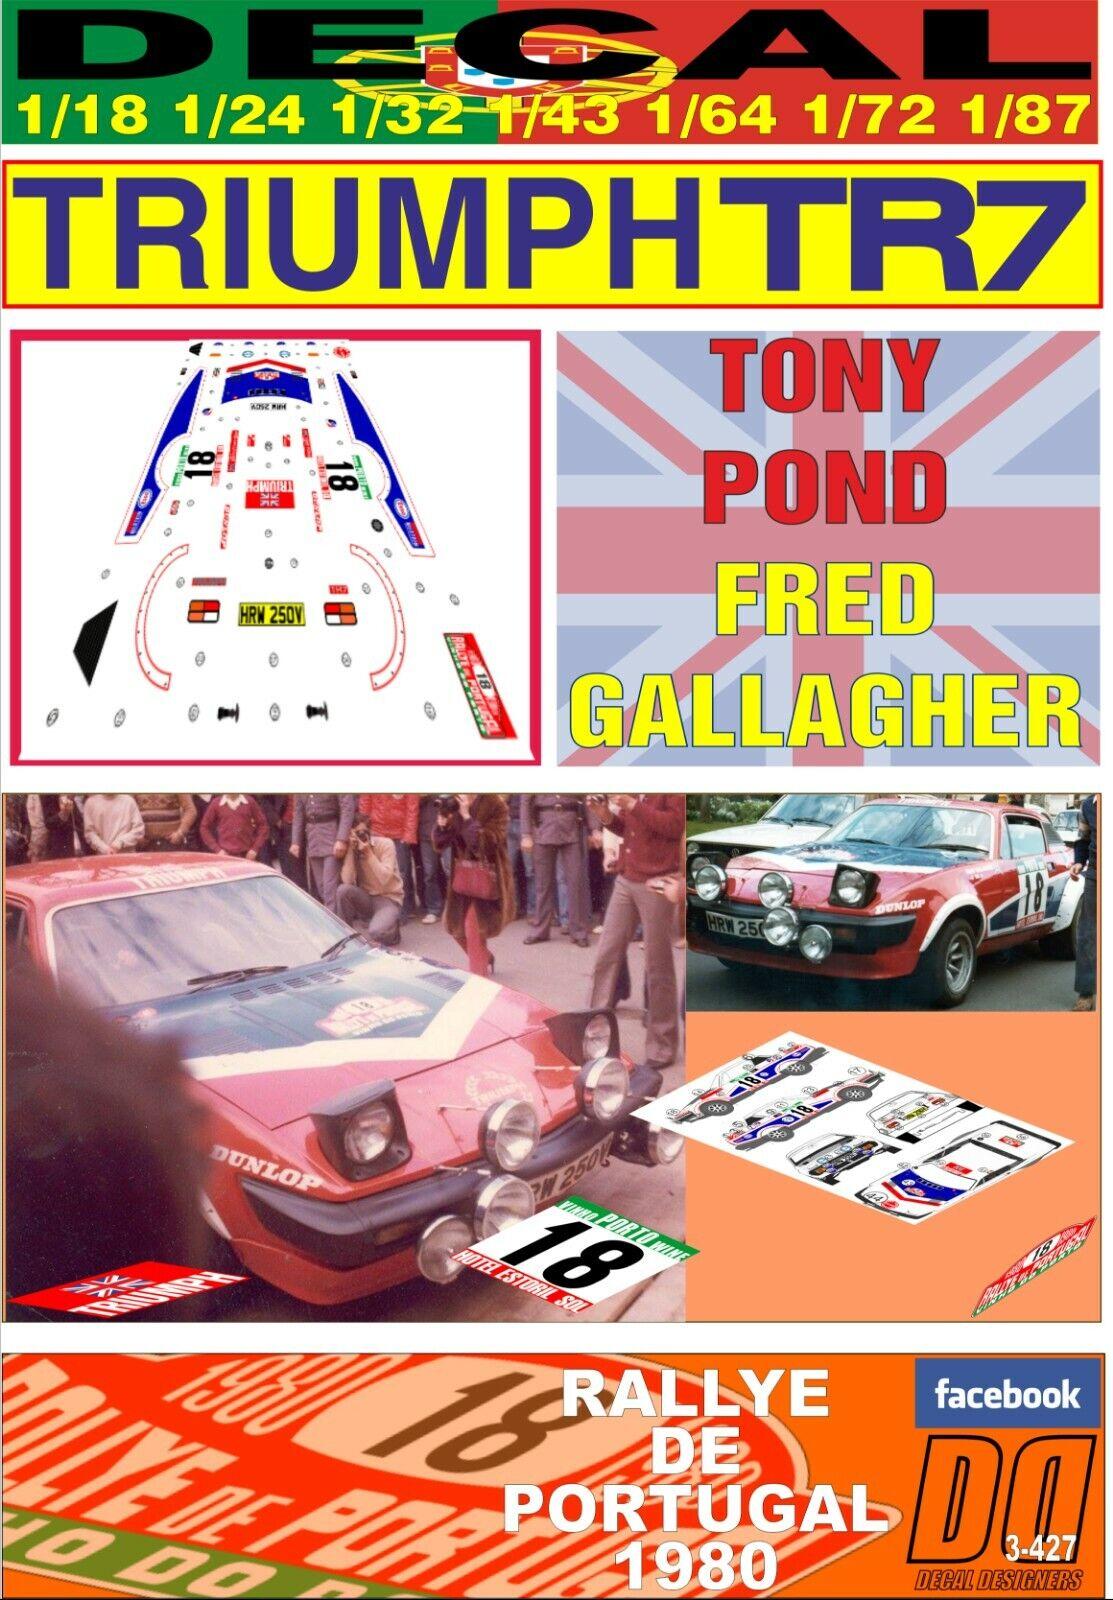 DECAL TRIUMPH TR7 V8 TONY POND RALLYE PORTUGAL 1980 DnF (FULL) (05)